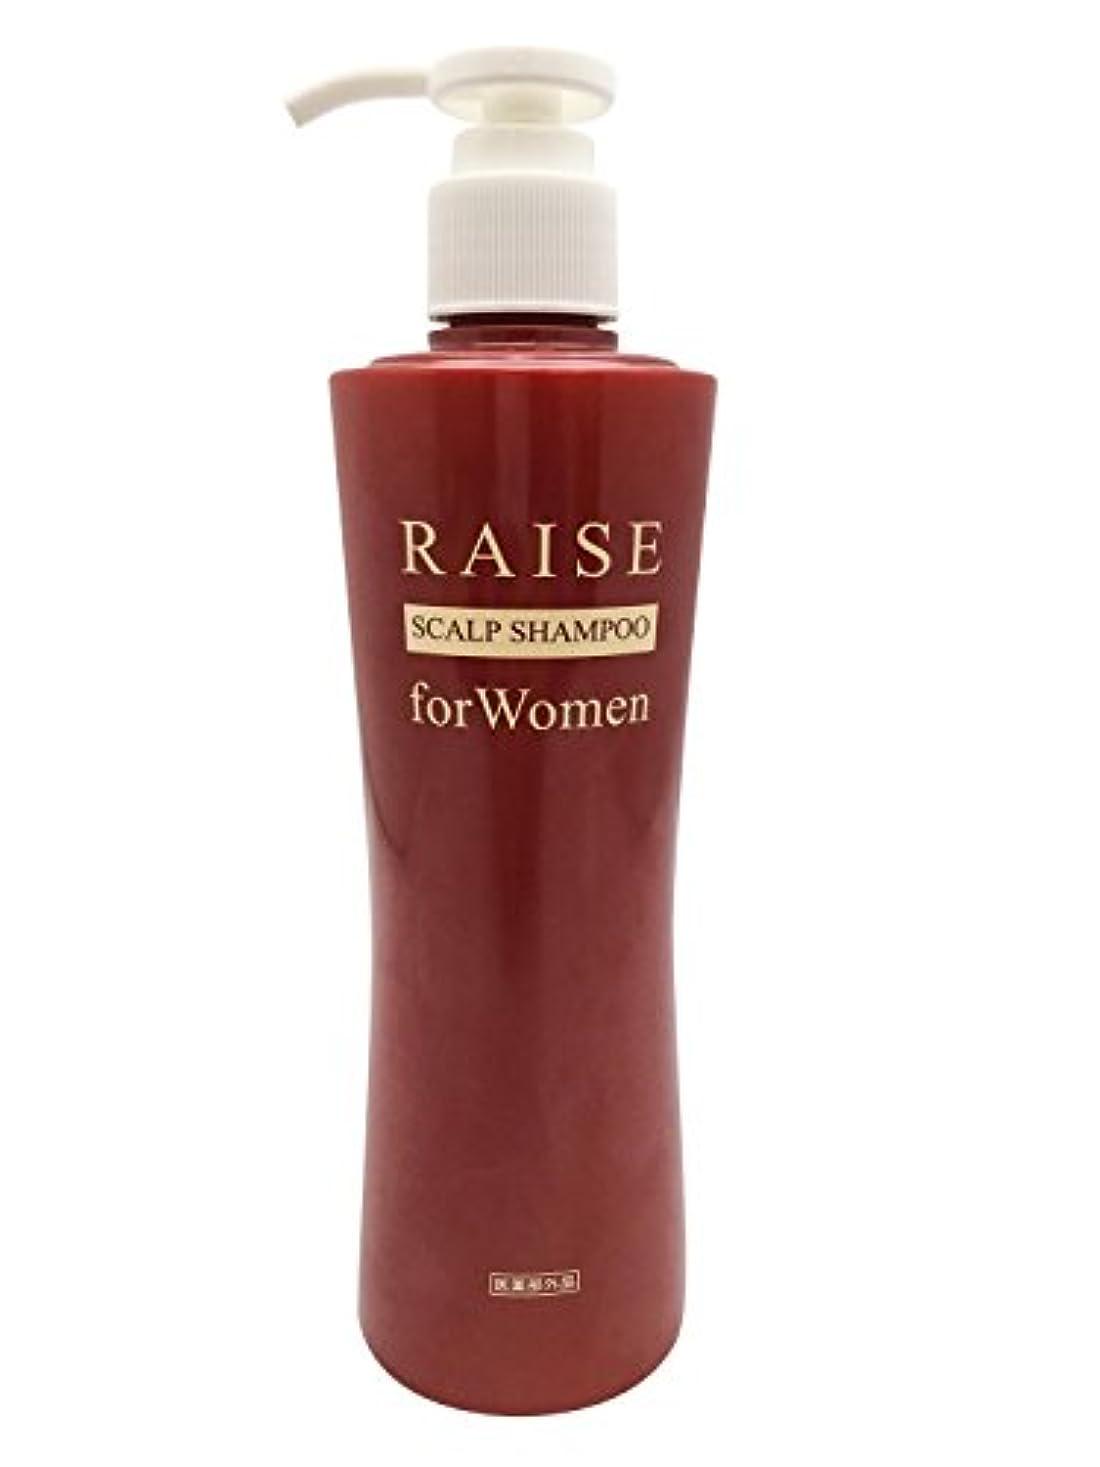 RAISE スカルプシャンプー for Women 【医薬部外品】